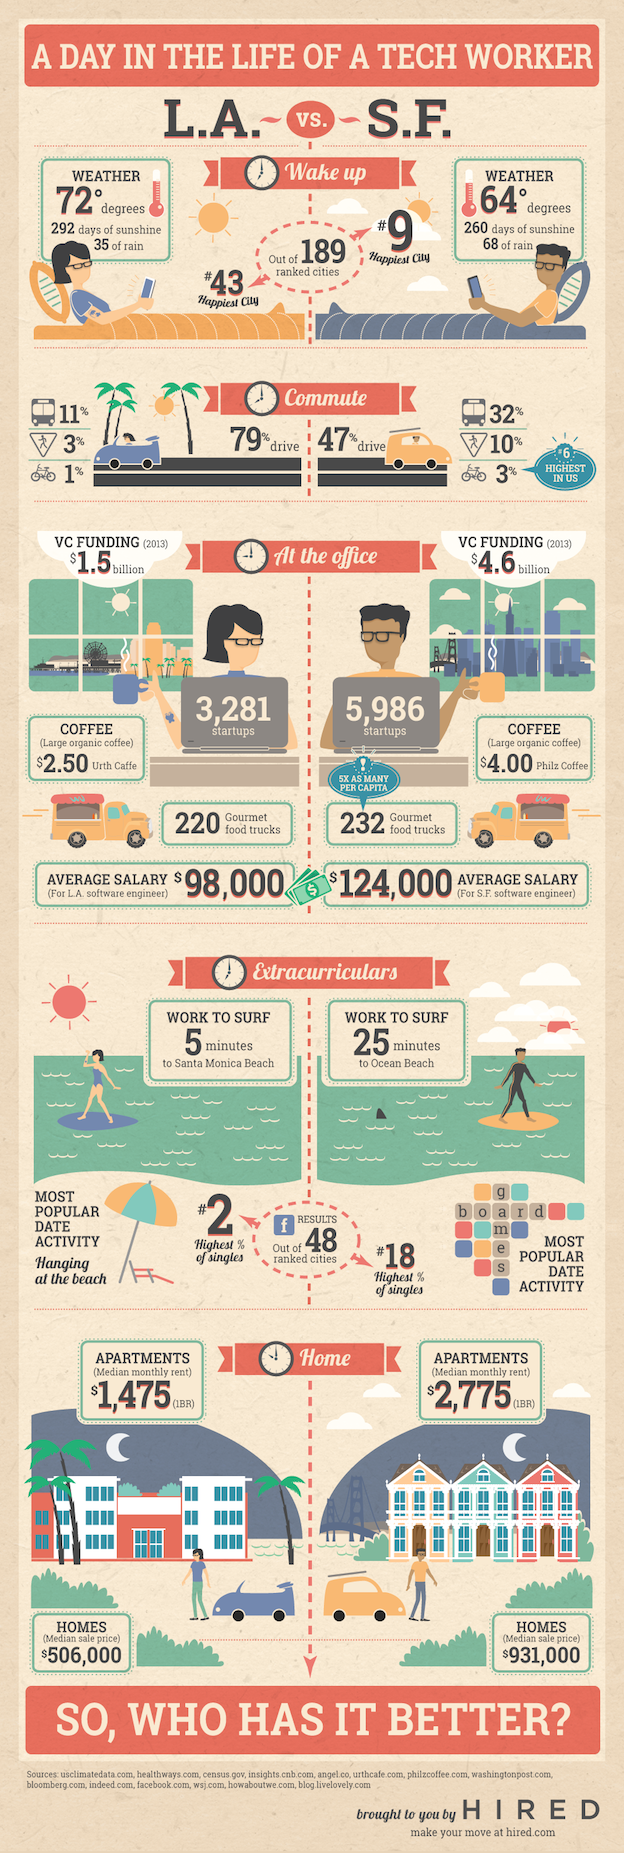 LA vs SF - Where do tech workers have it better?